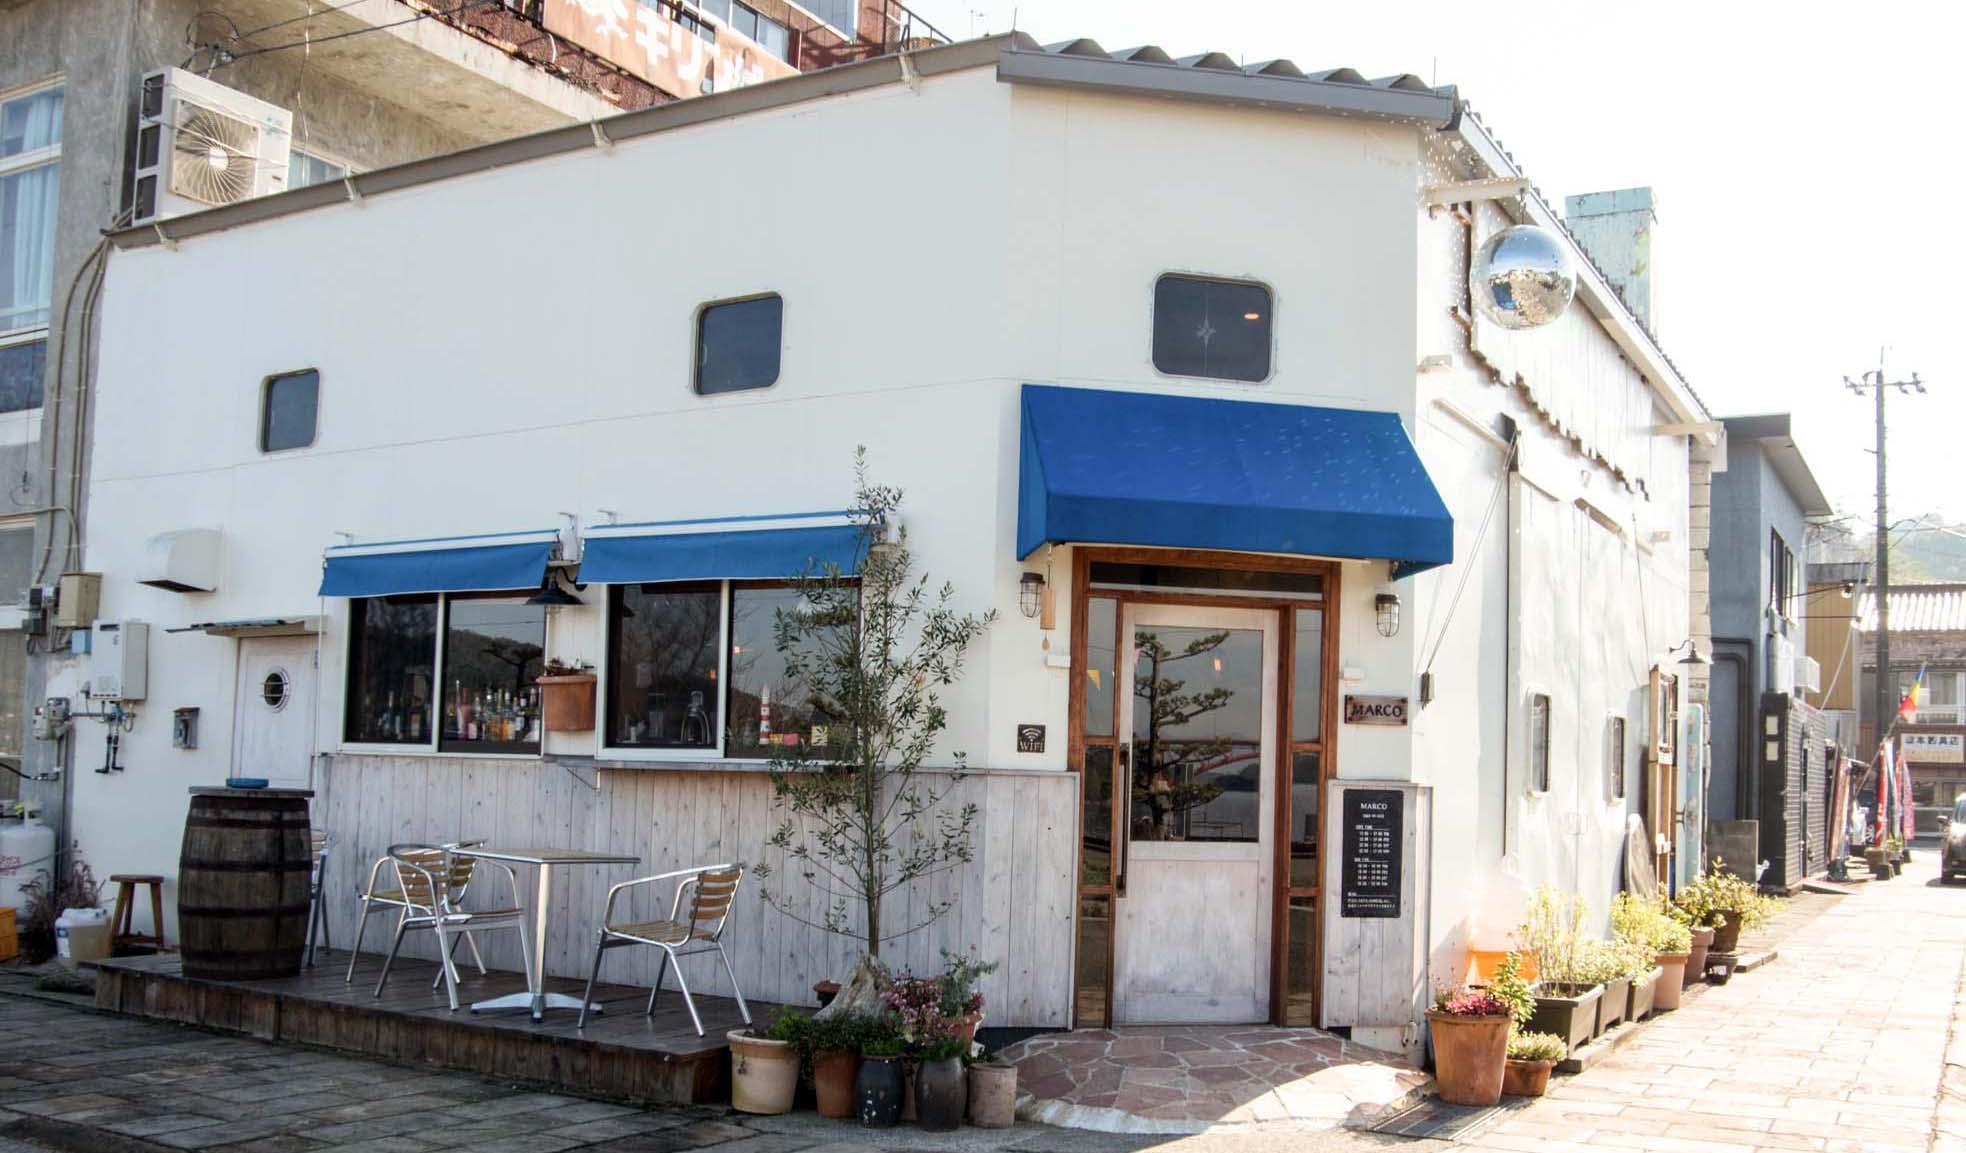 Cafe&Bar Marcoの外観